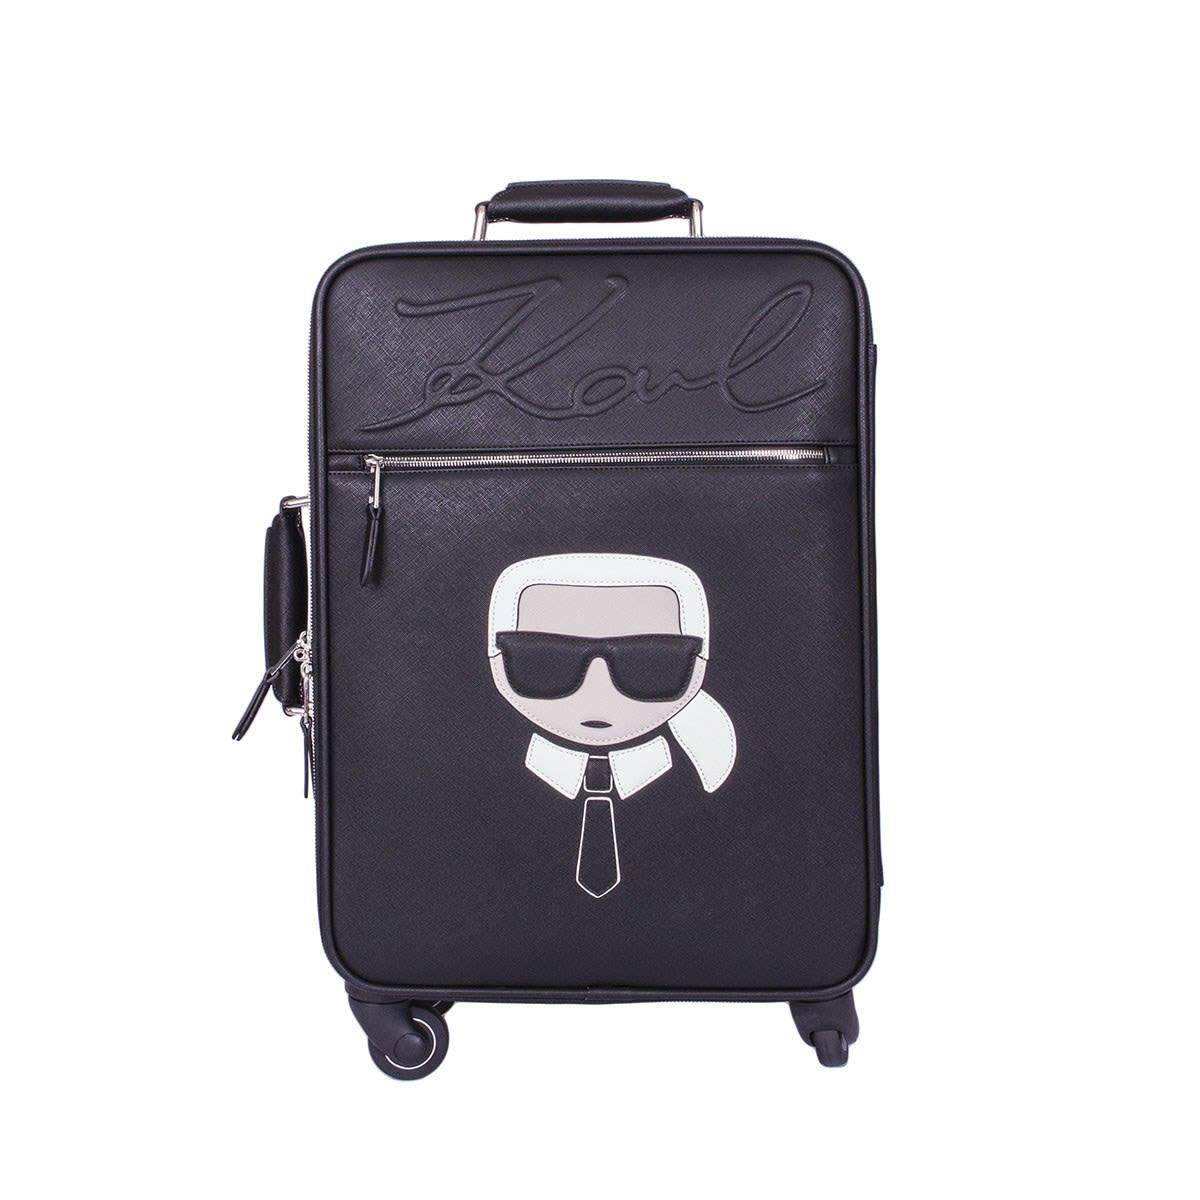 7f3cc09d2069 Karl Lagerfeld Karl Lagerfeld K ikonik Trolley - Basic - 10839119 ...